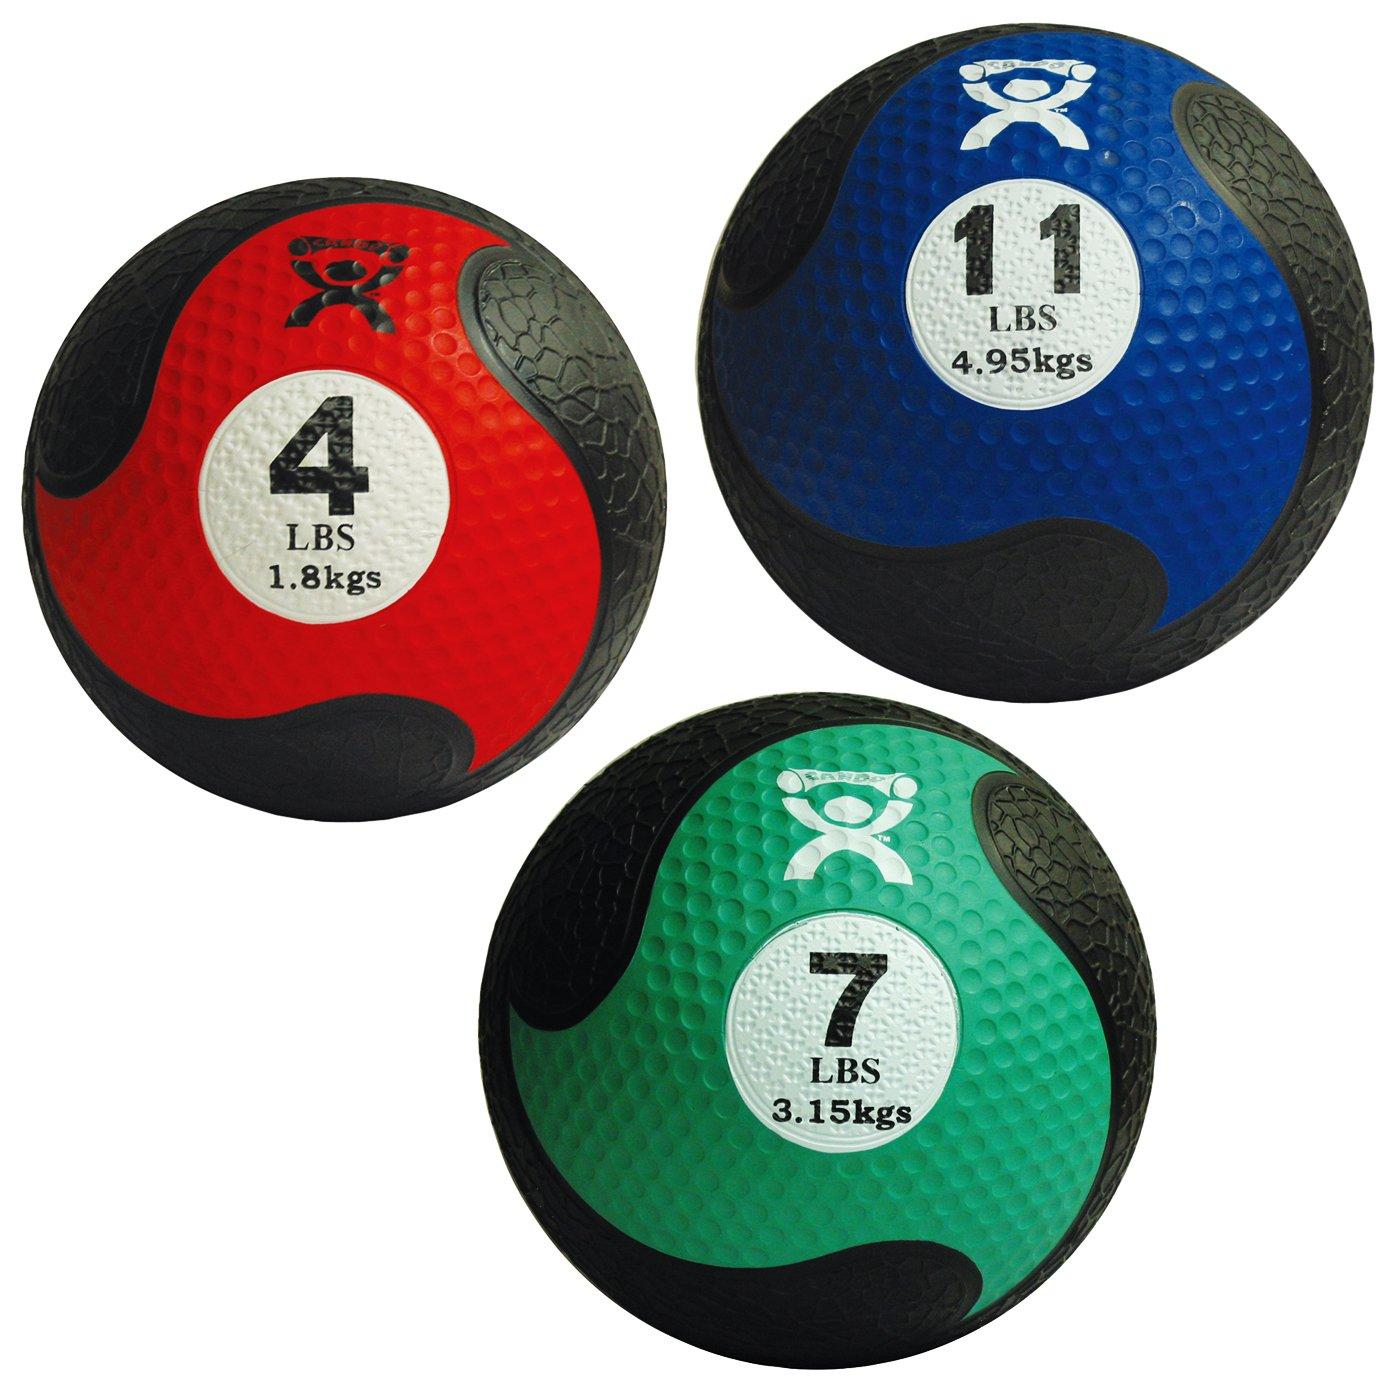 Cando Firm Fitness Medicine Balls - 3-Piece Bundle - 1 Each: 4, 7, 11 LB